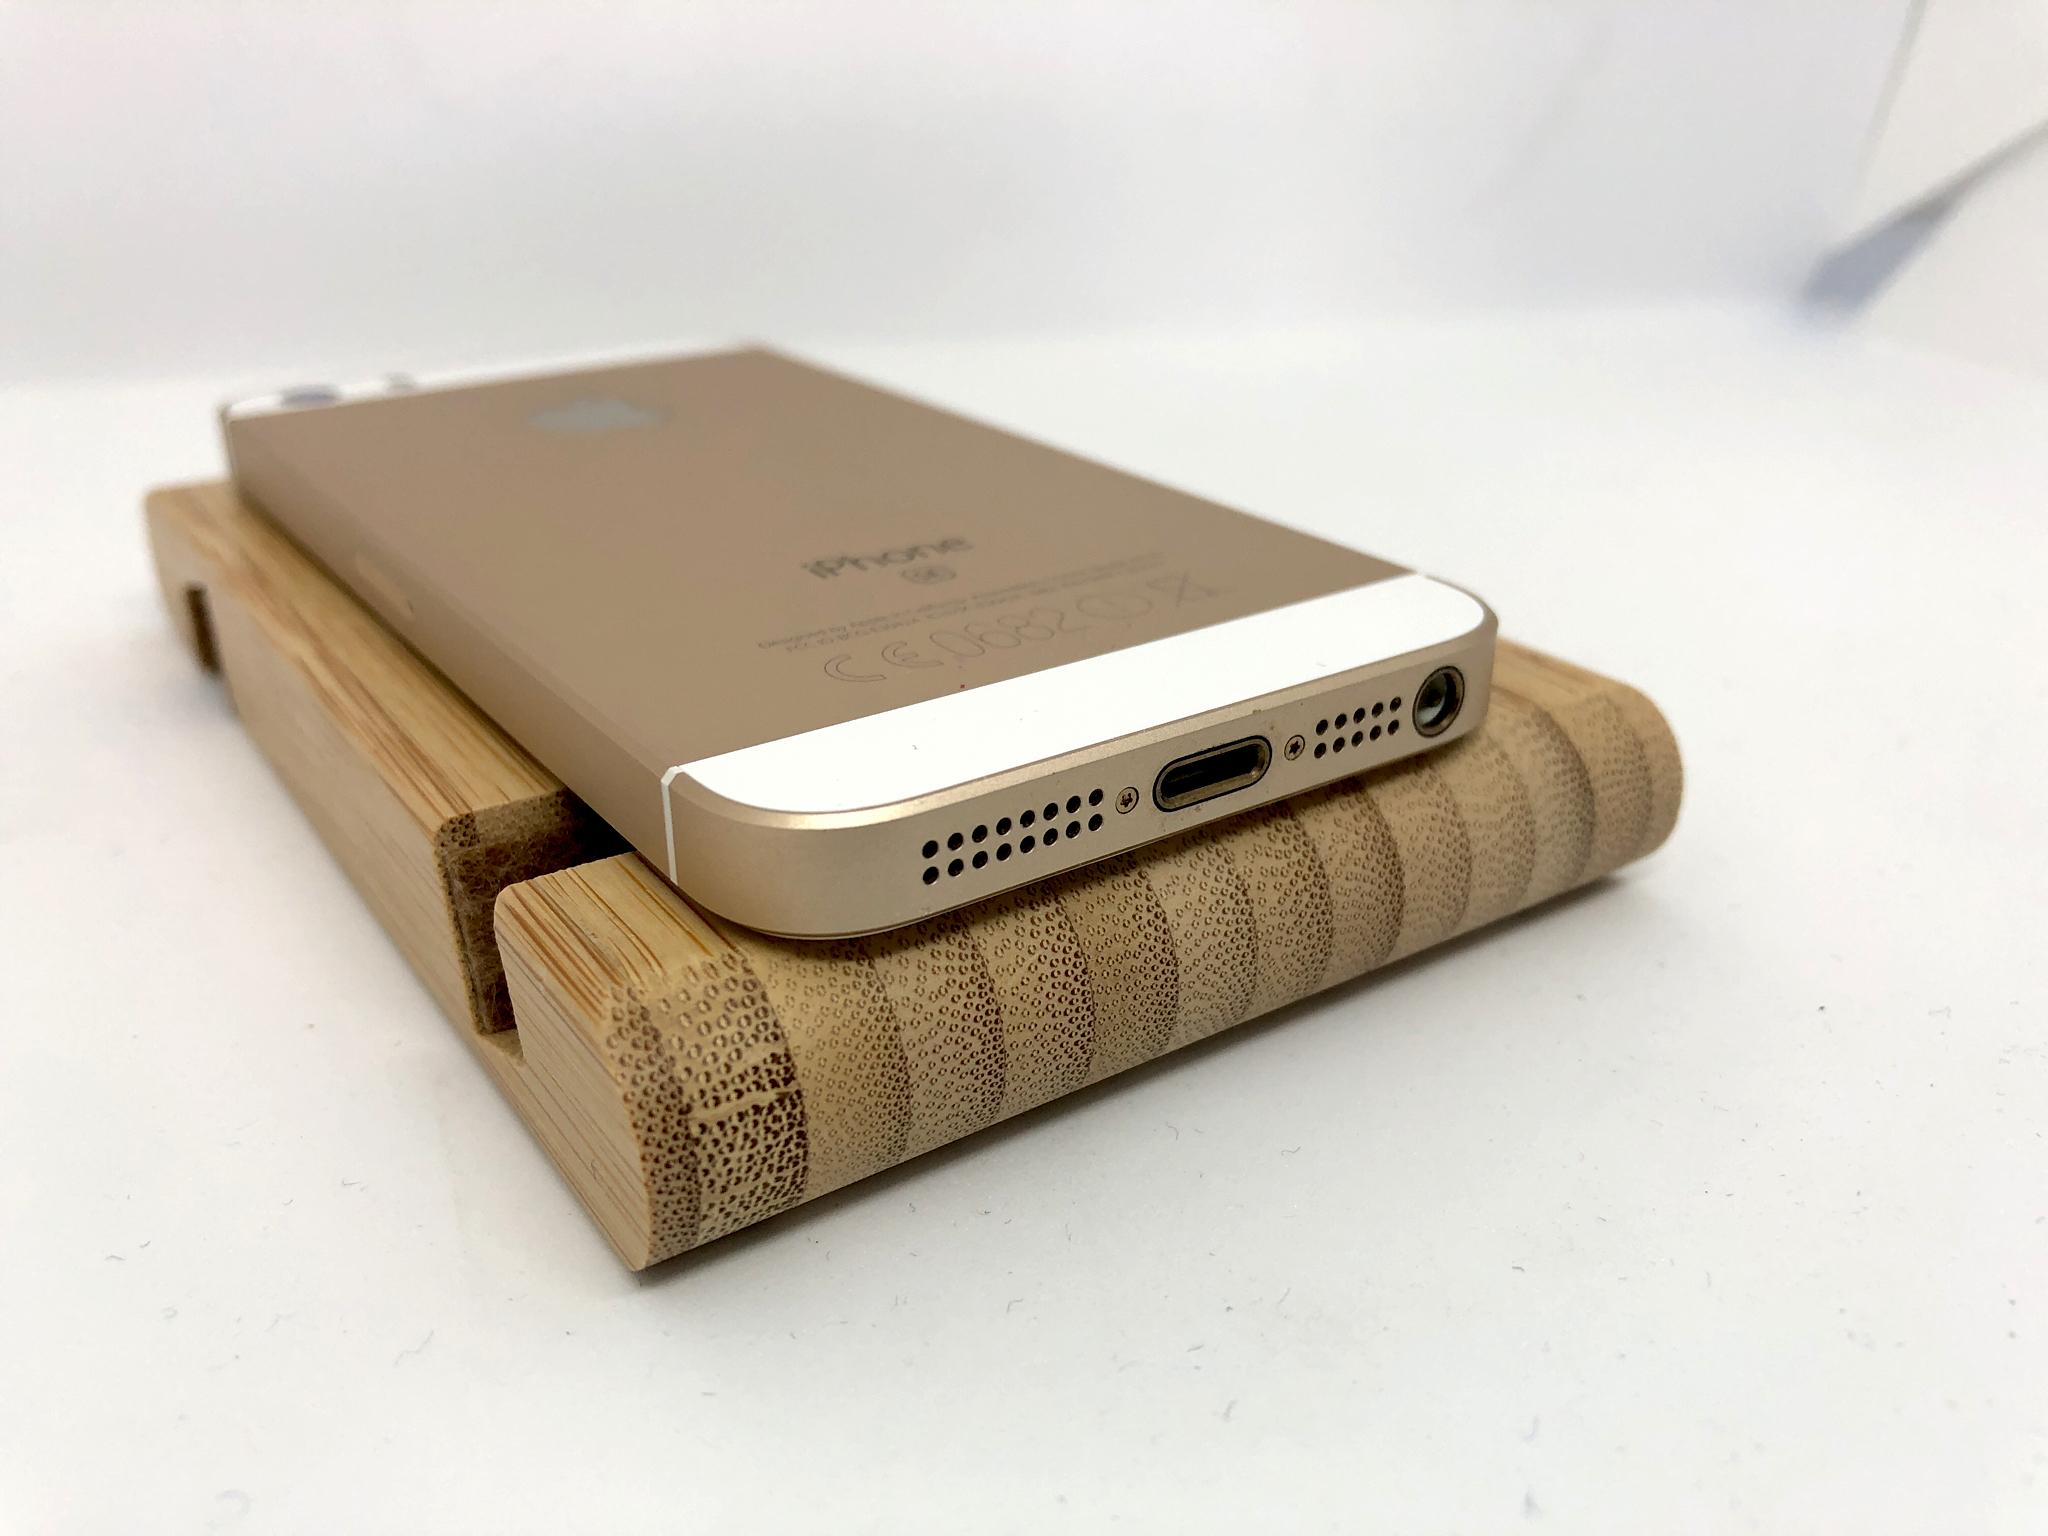 iPhone SE 16GB, 16 GB, Gold, Afbeelding 4